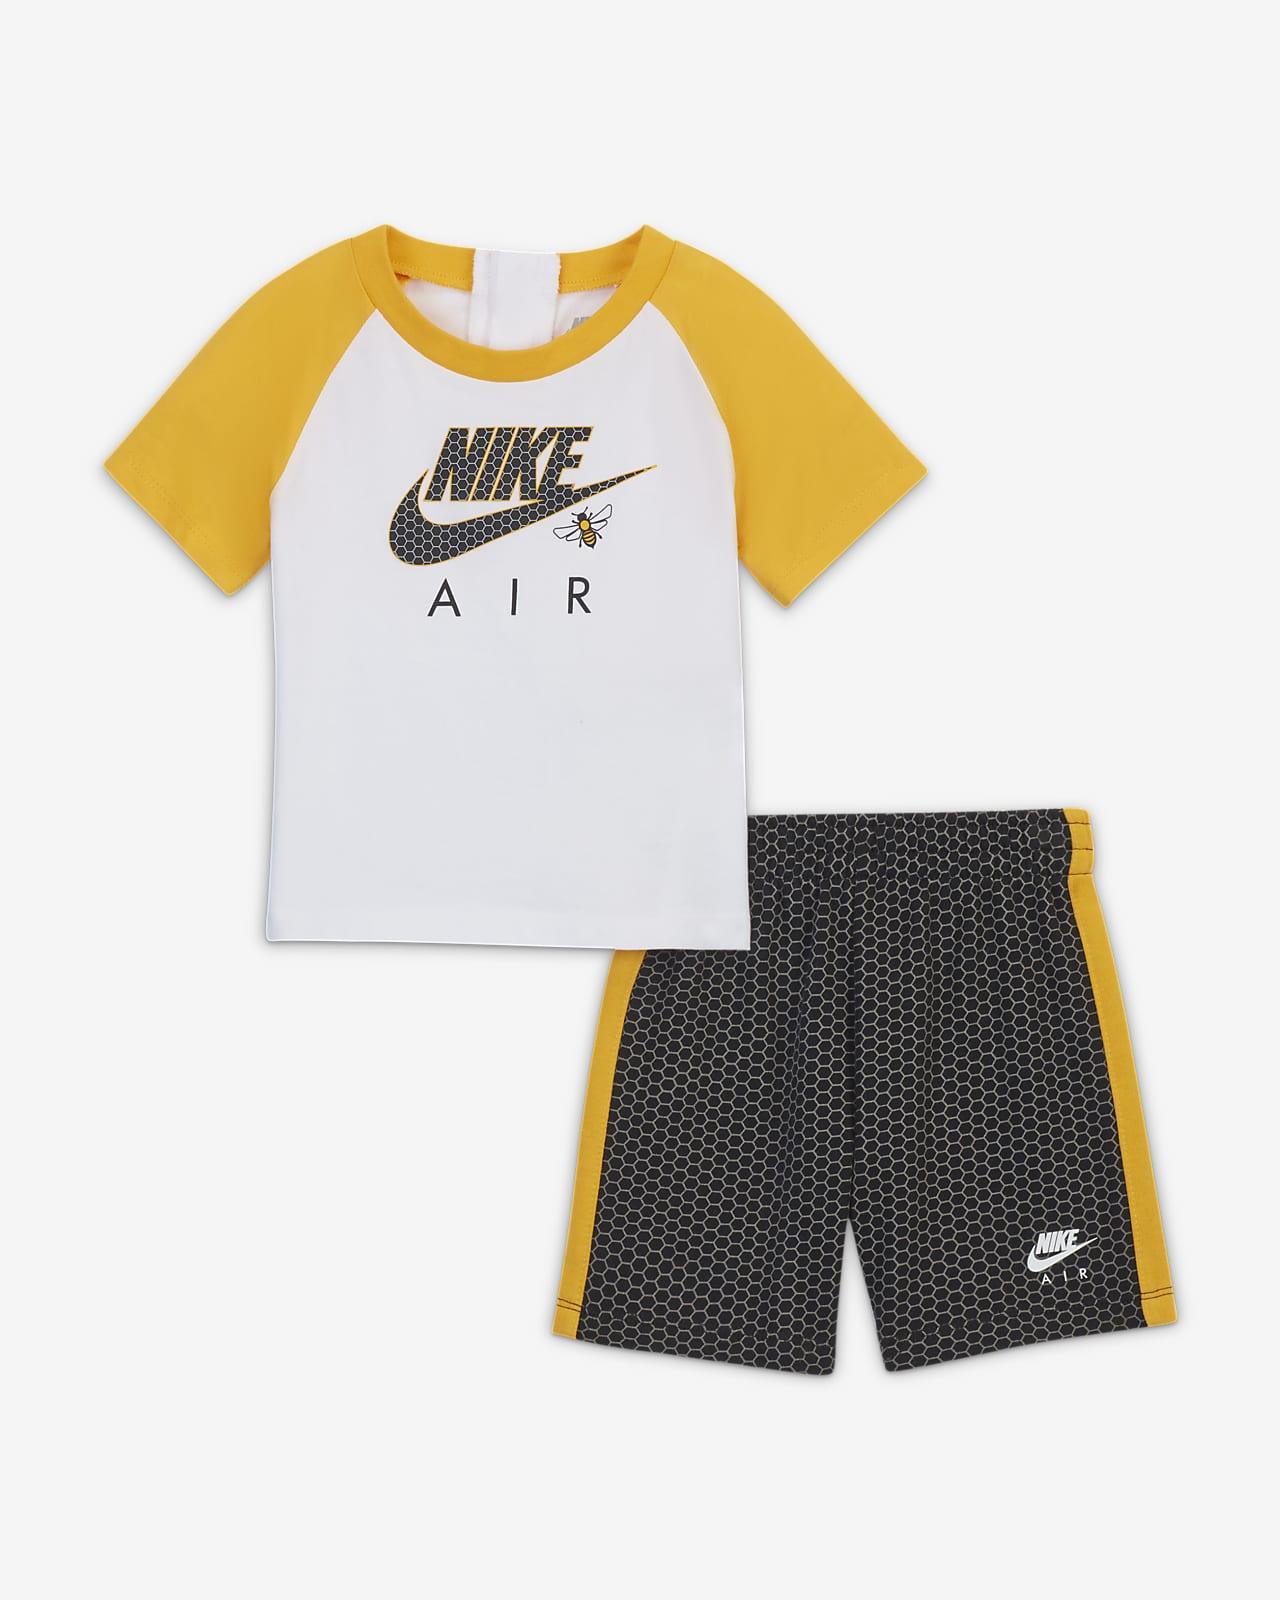 Nike Baby (12-24M) T-Shirt and Shorts Set